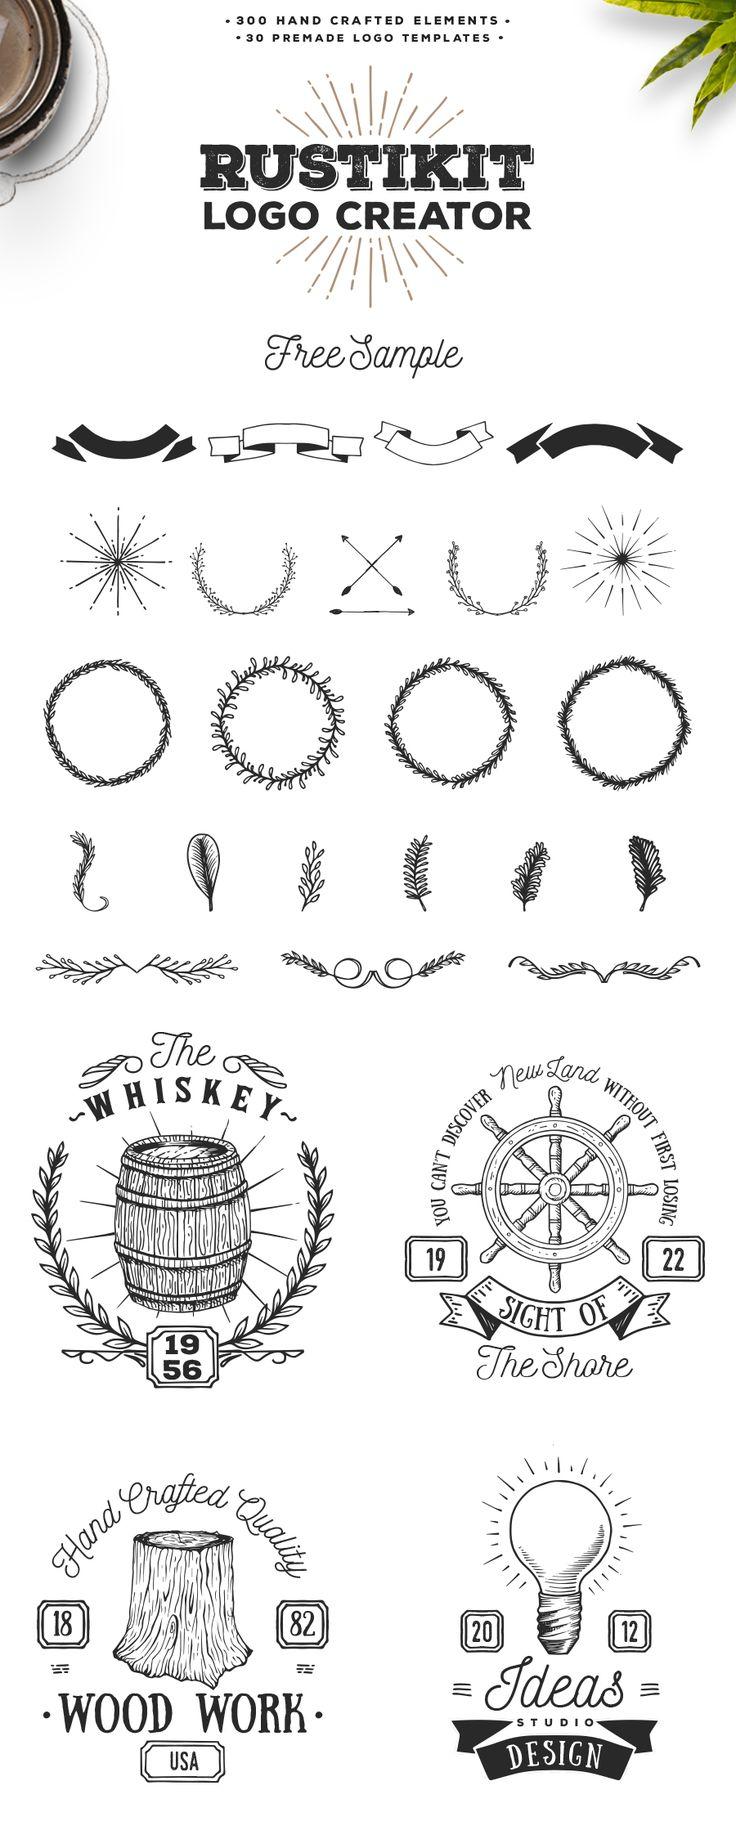 Rustikit Logo Creator – Free Sample (Ai & Psd) (4.2 MB) | freedesignresources.net | #free #illustrator #vector #logo #creator